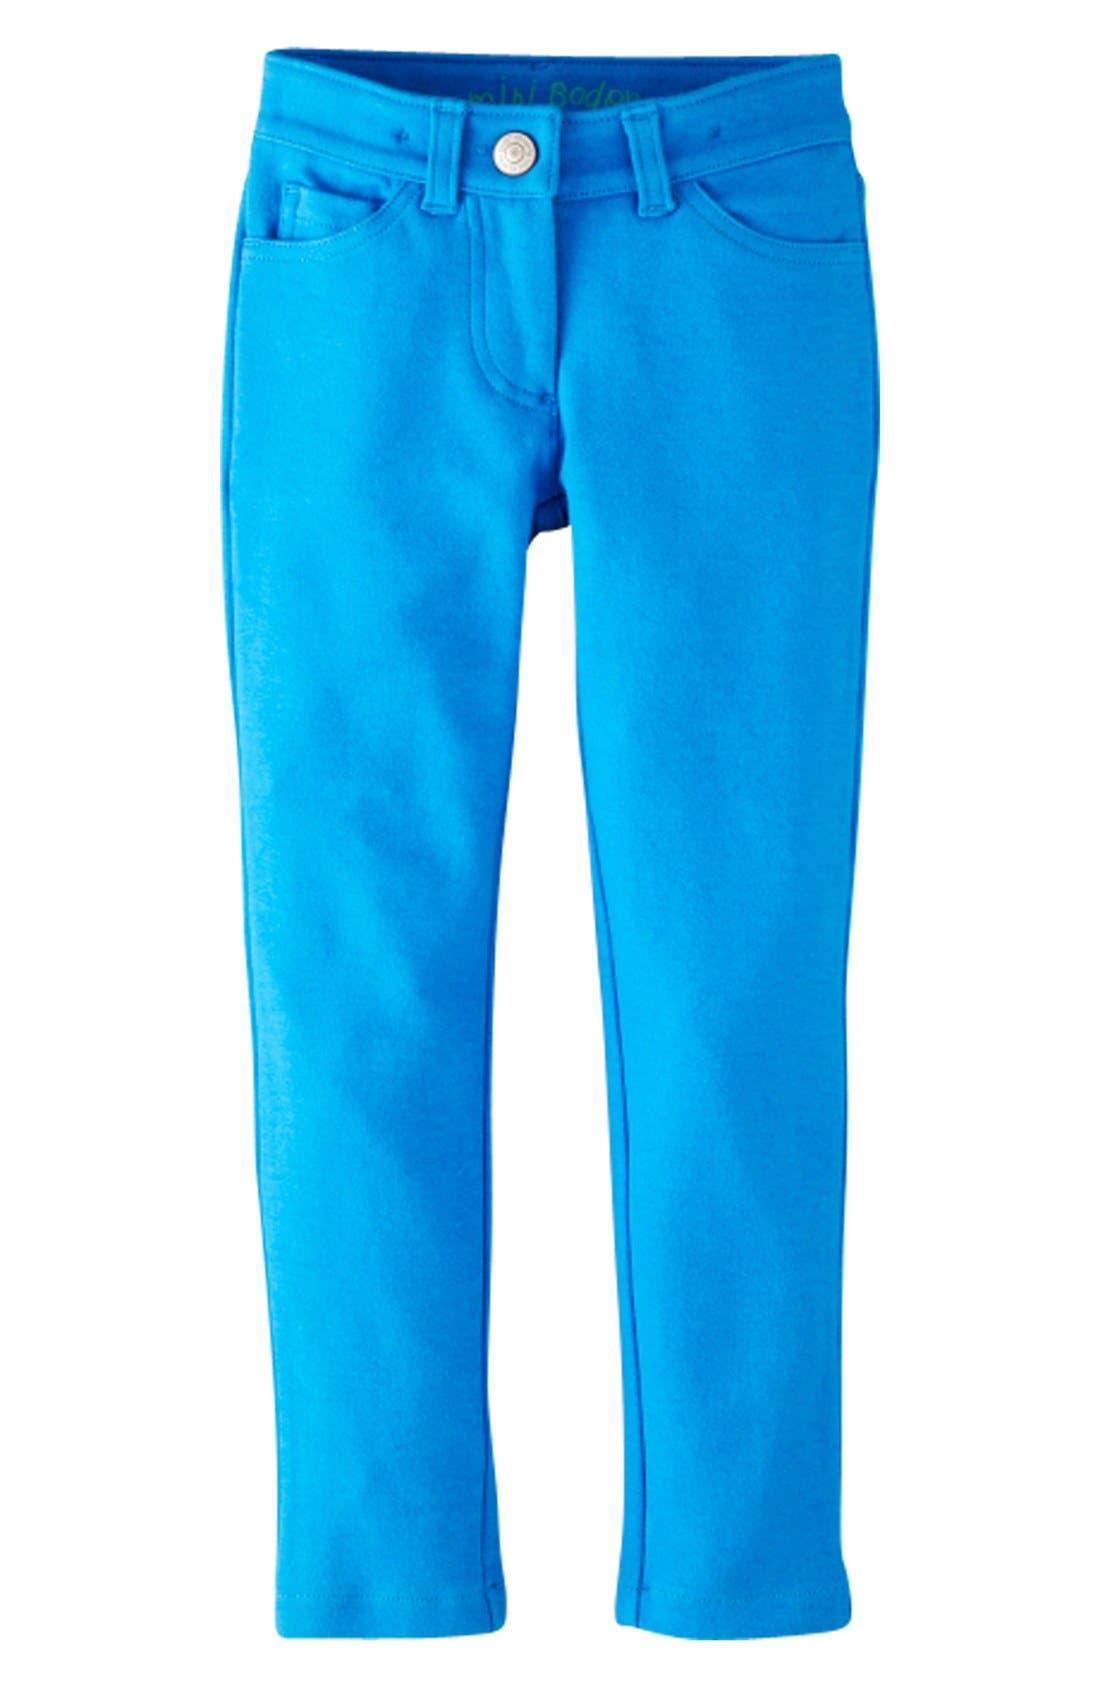 Alternate Image 1 Selected - Mini Boden Jersey Knit Jeans (Toddler Girls, Little Girls & Big Girls)